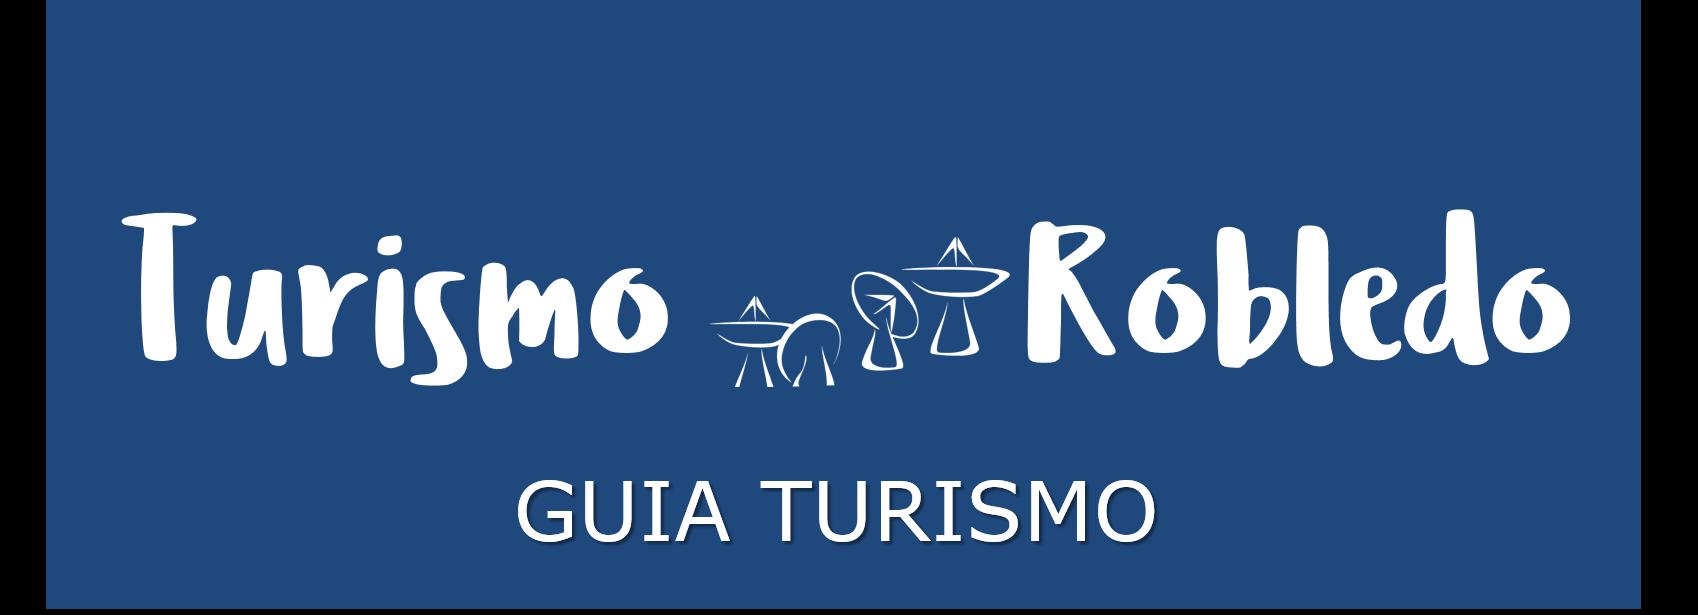 Turismo Robledo